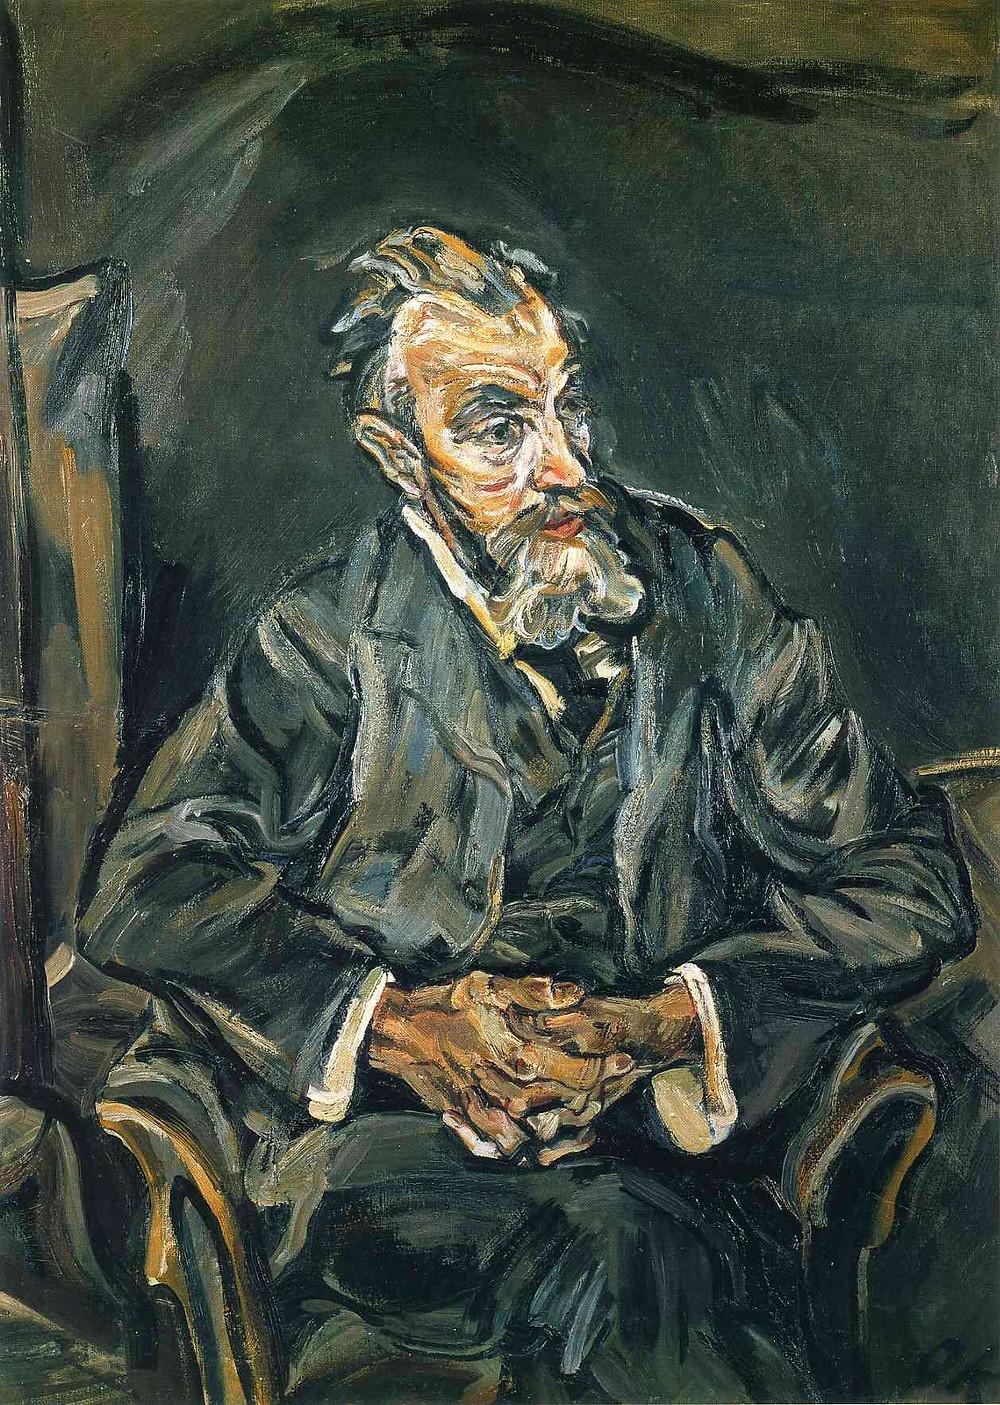 Oscar Kokoschka, The Painter Carl Moll, 1913